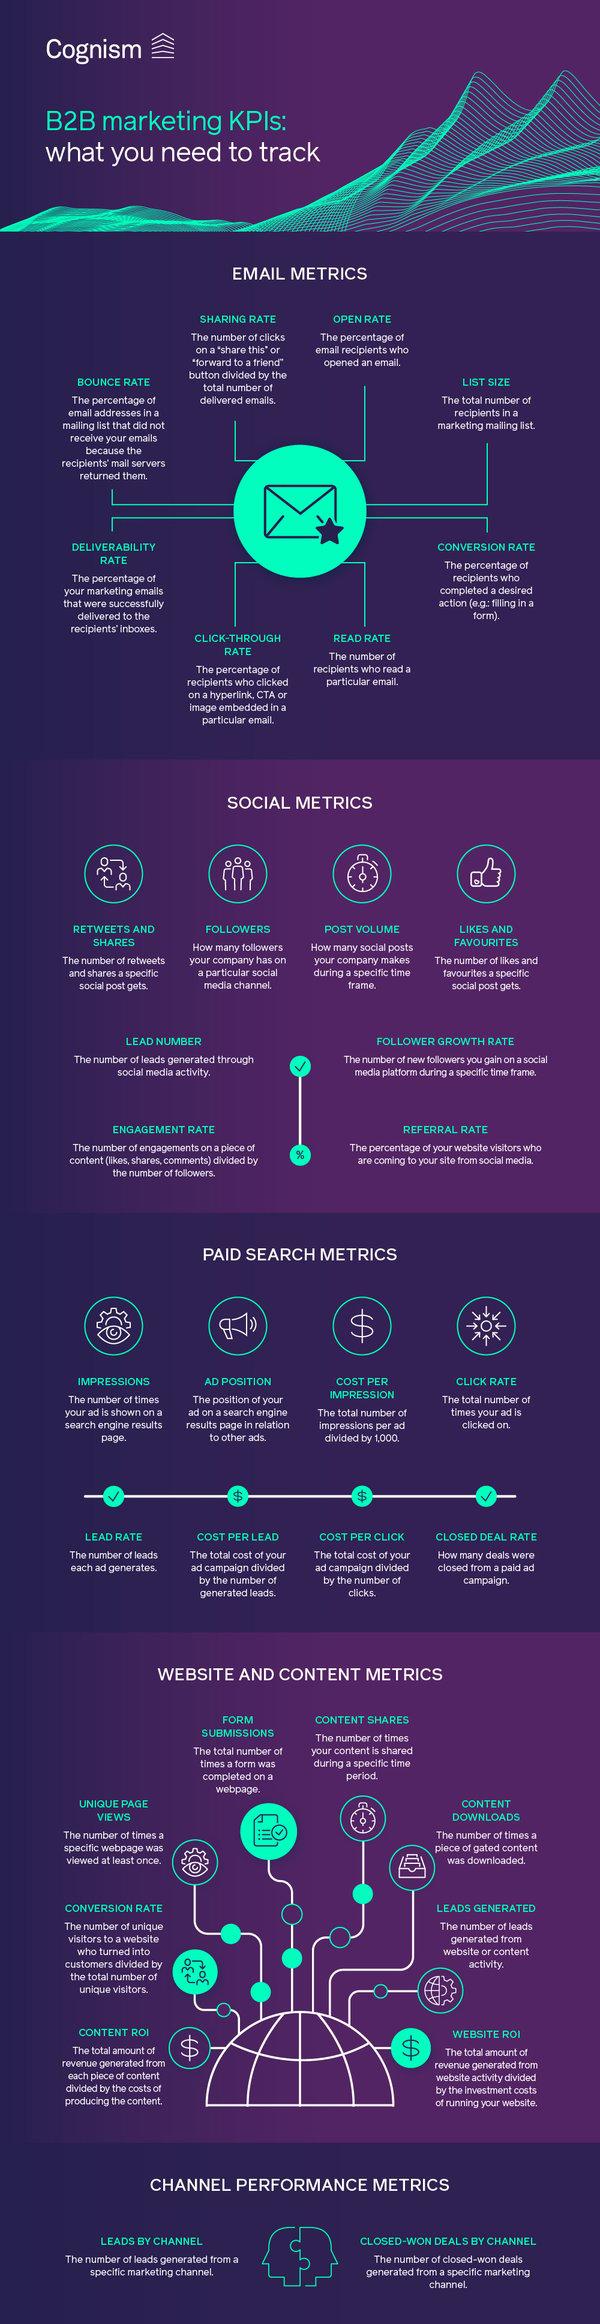 B2B marketing KPIs